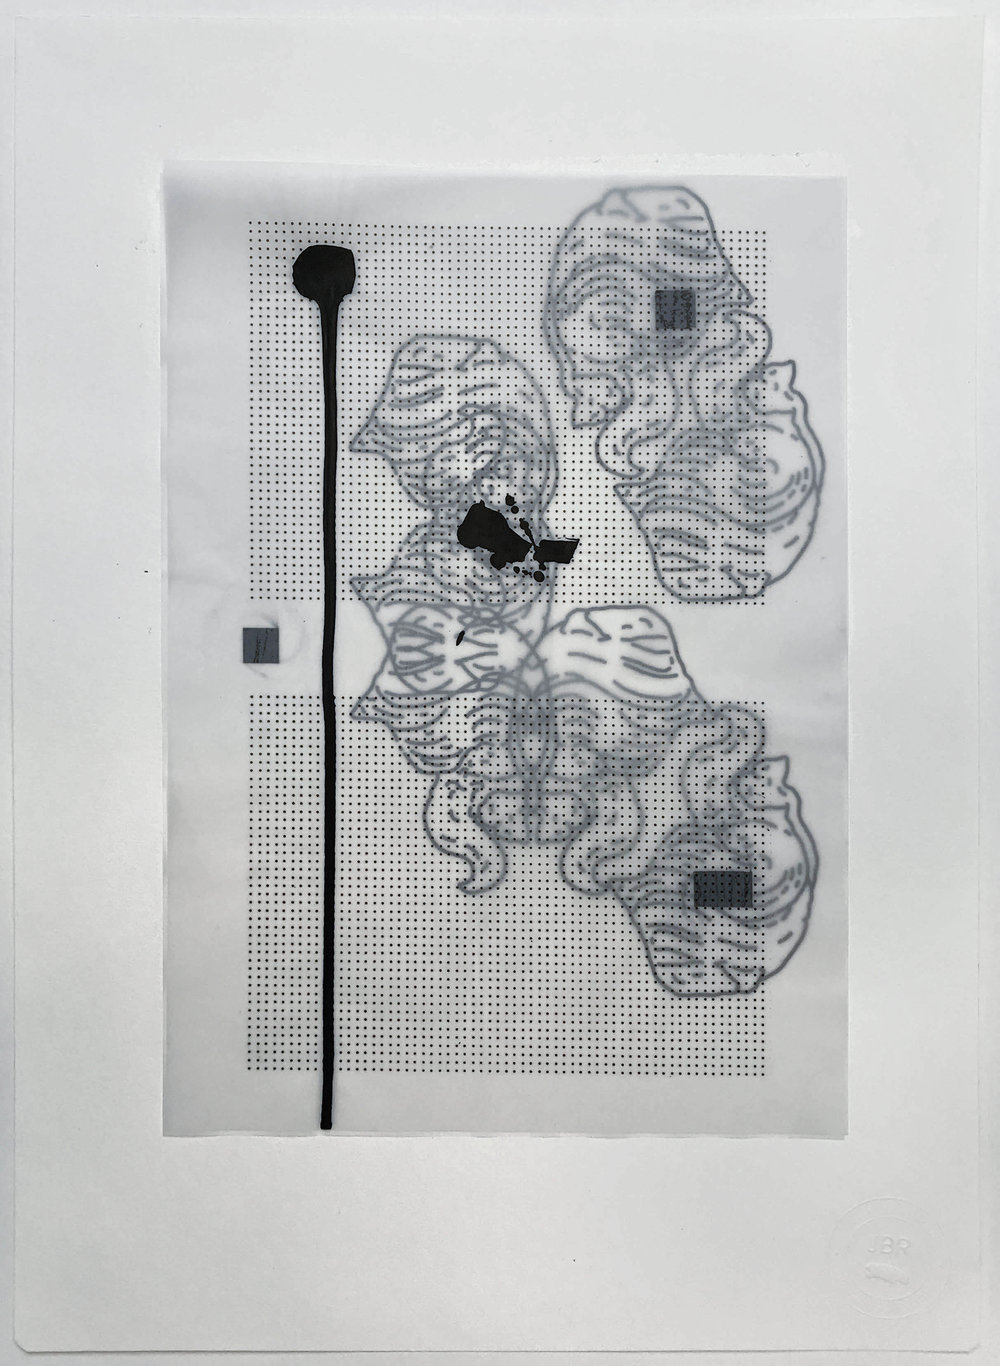 %22Nodo eterno%22- Técnica mixta  - 42 x 30 cm - Julián Brangold - 2018.jpg